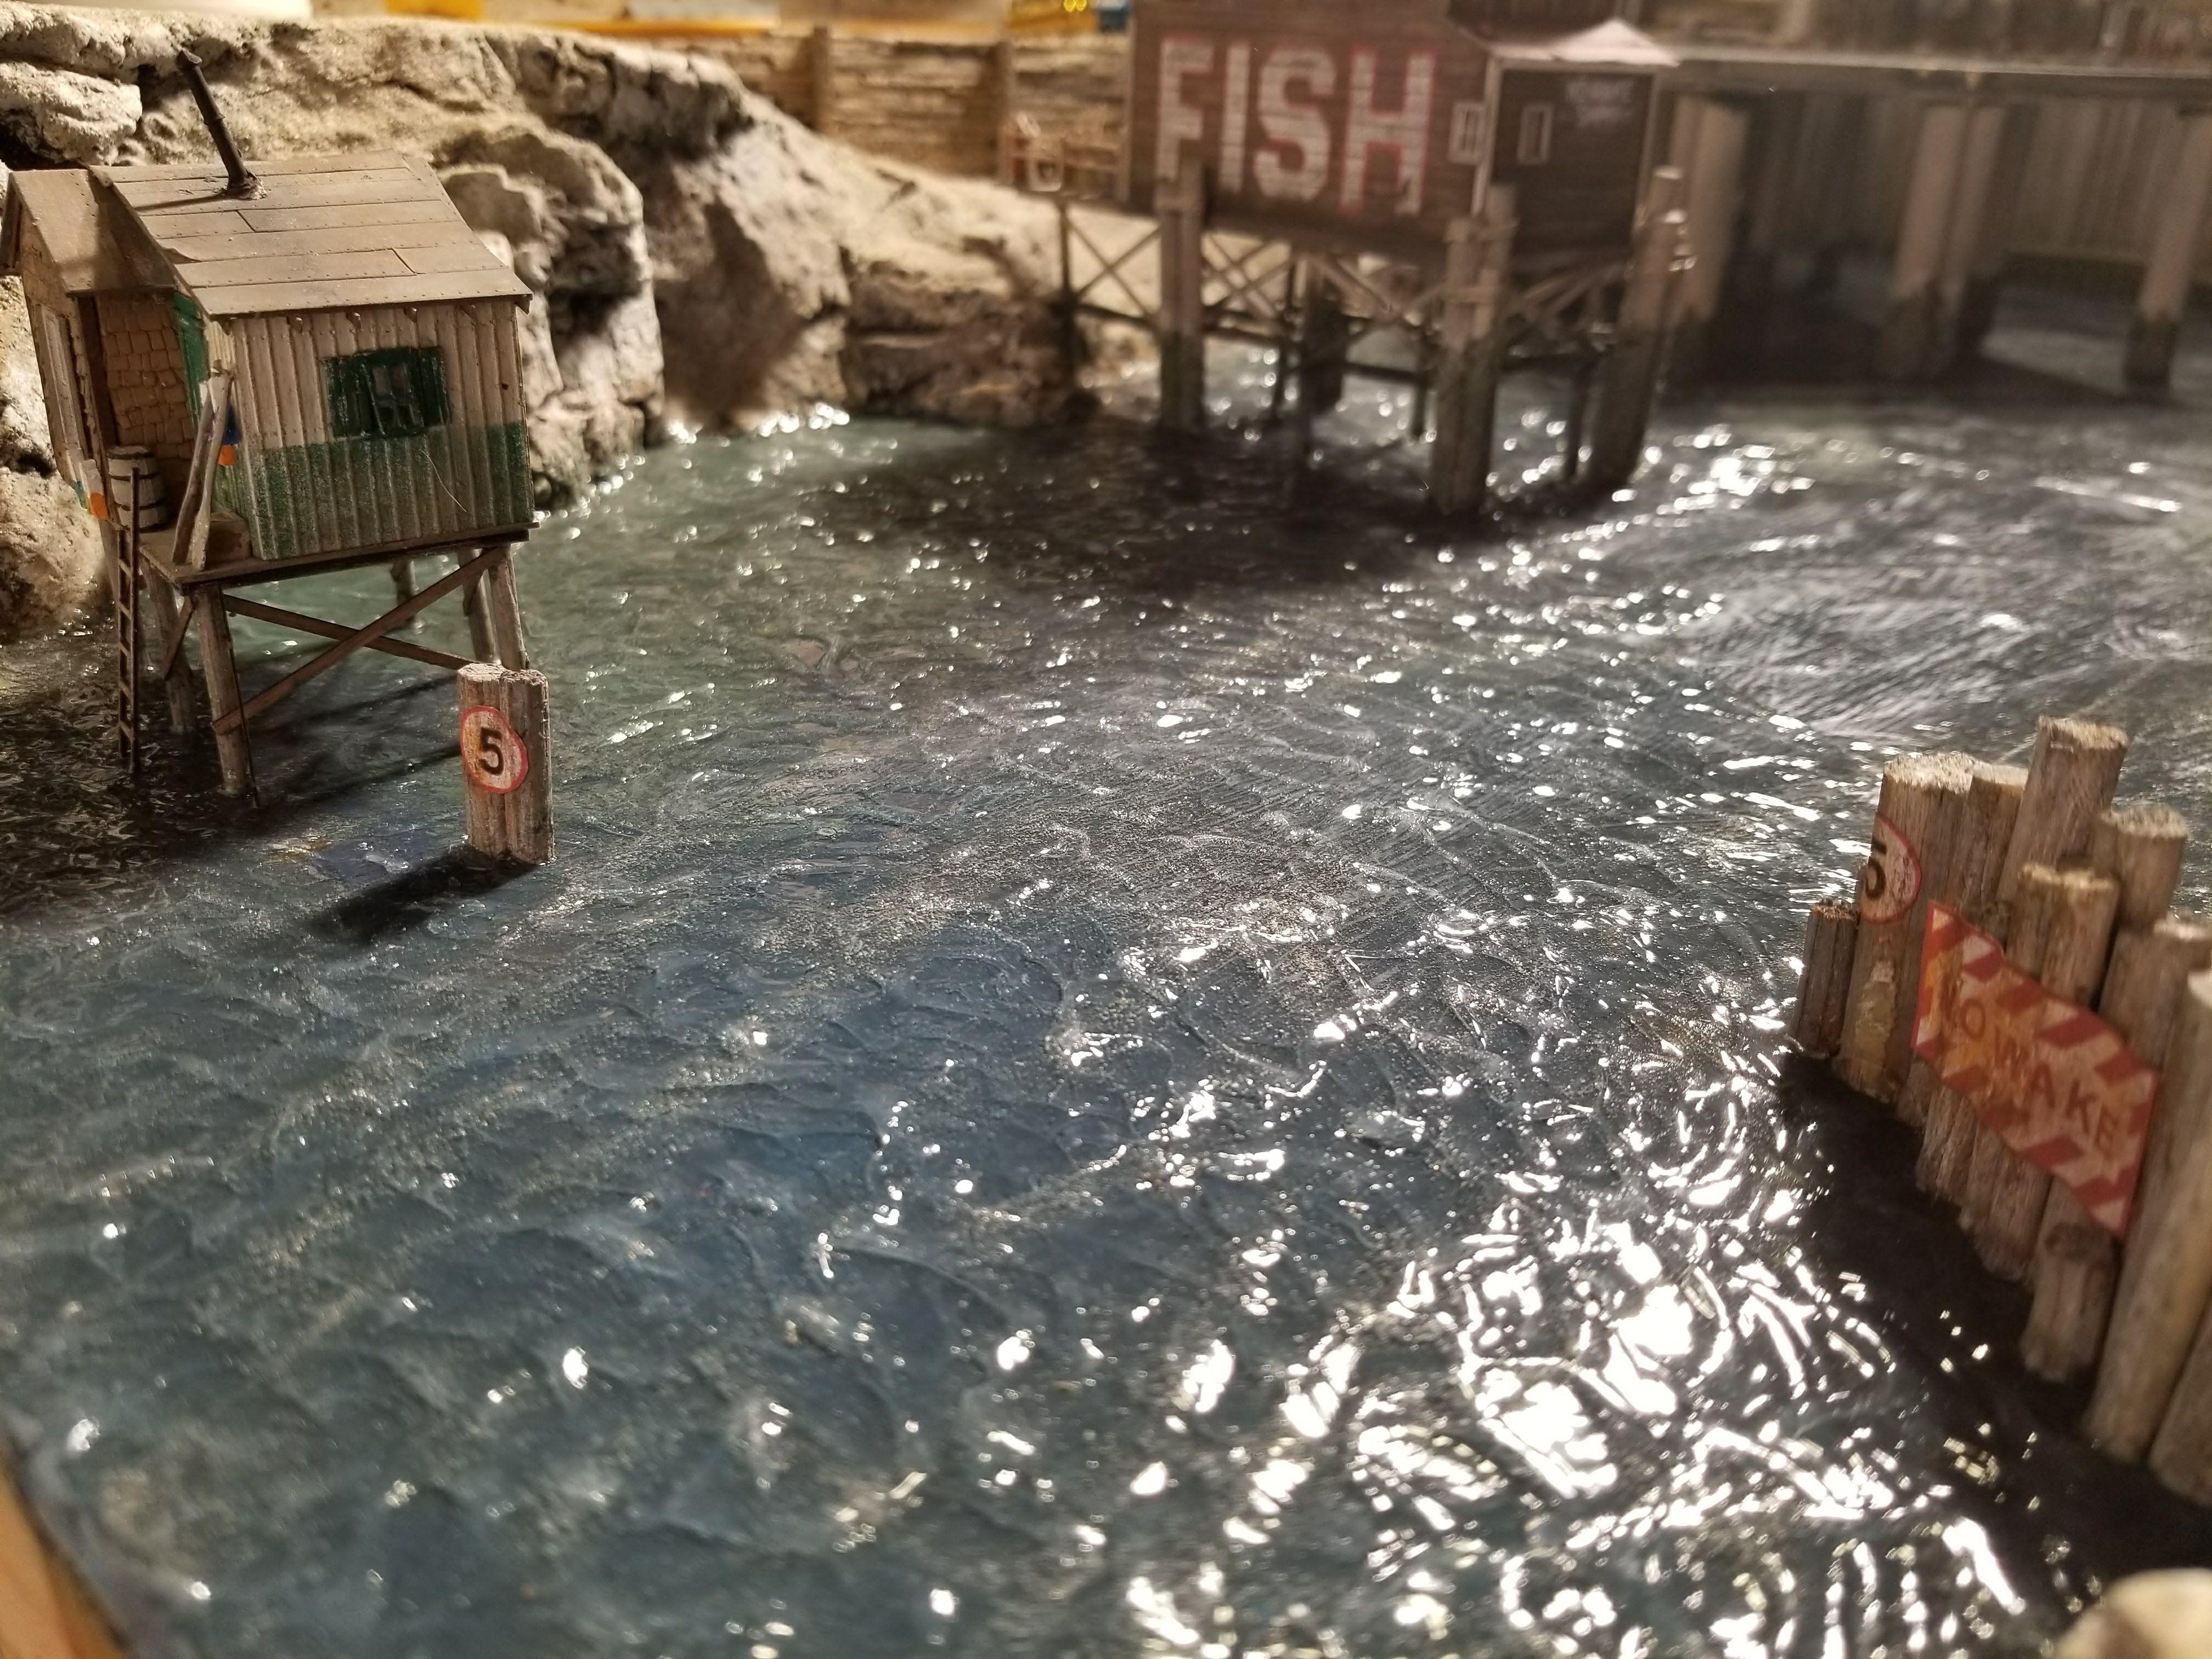 water train layout making gel scenery texture waves podge mod hoscalecustoms diorama scene create medium layouts trains read current